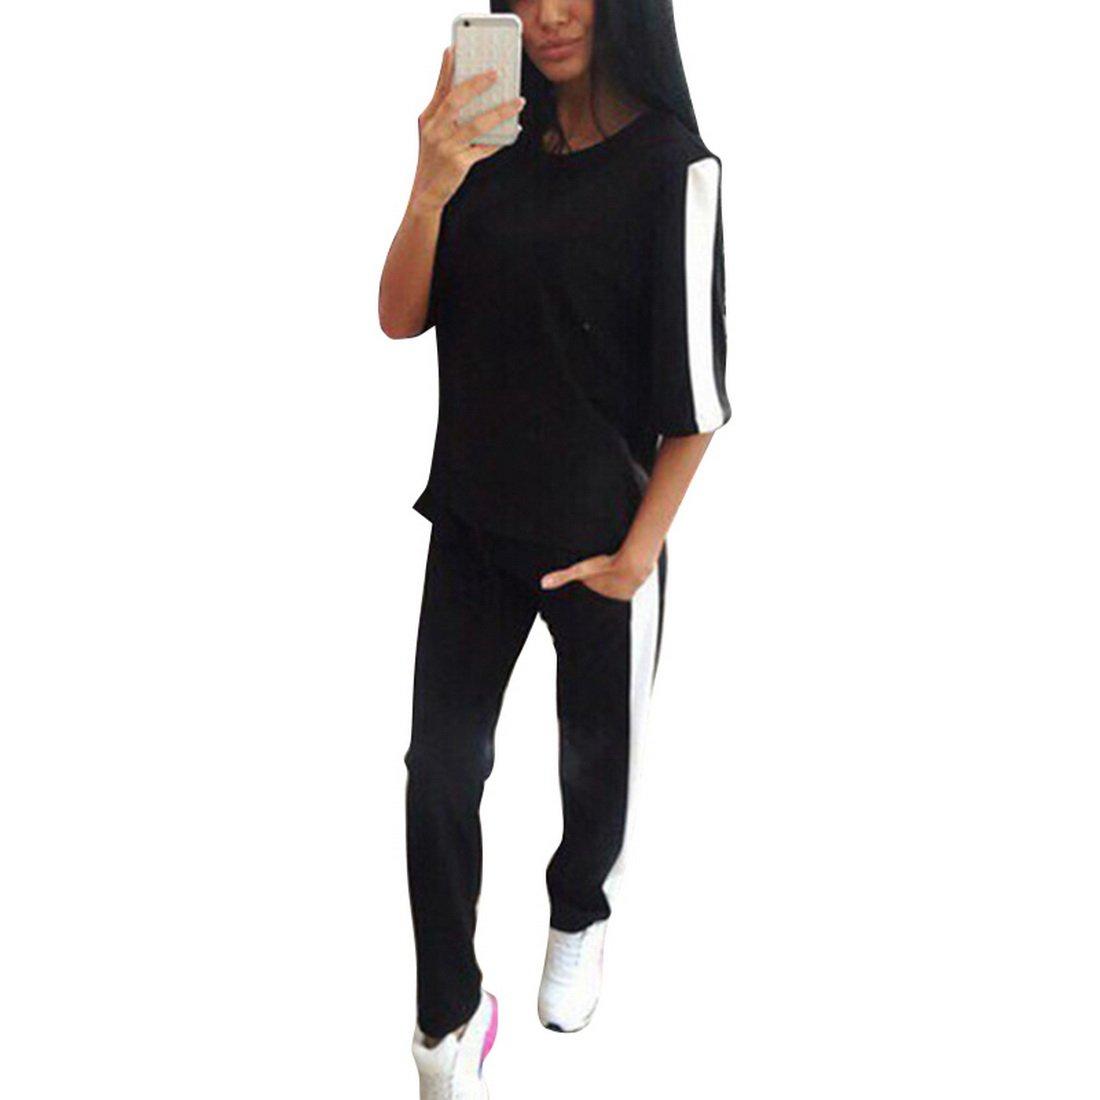 Dihope Damen Sportbekleidung Set aus 3/4 Ärmel Pullover mit Sport Hose Outfit Yoga Jogginganzug Trainingsanzug